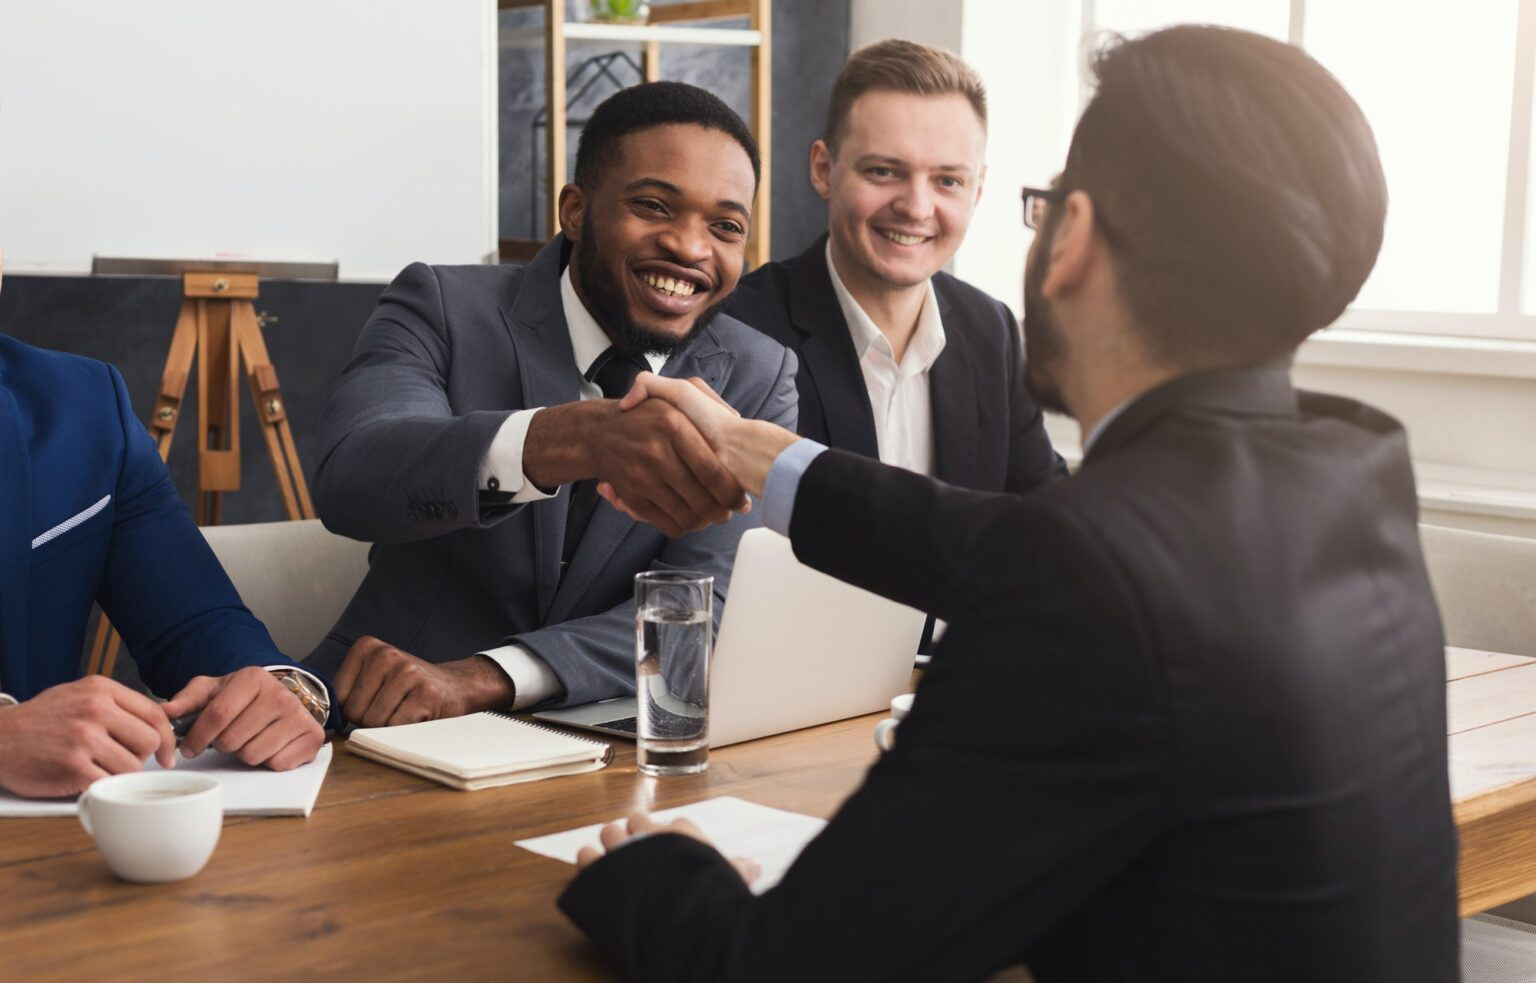 Business handshake at multiethnic office meeting